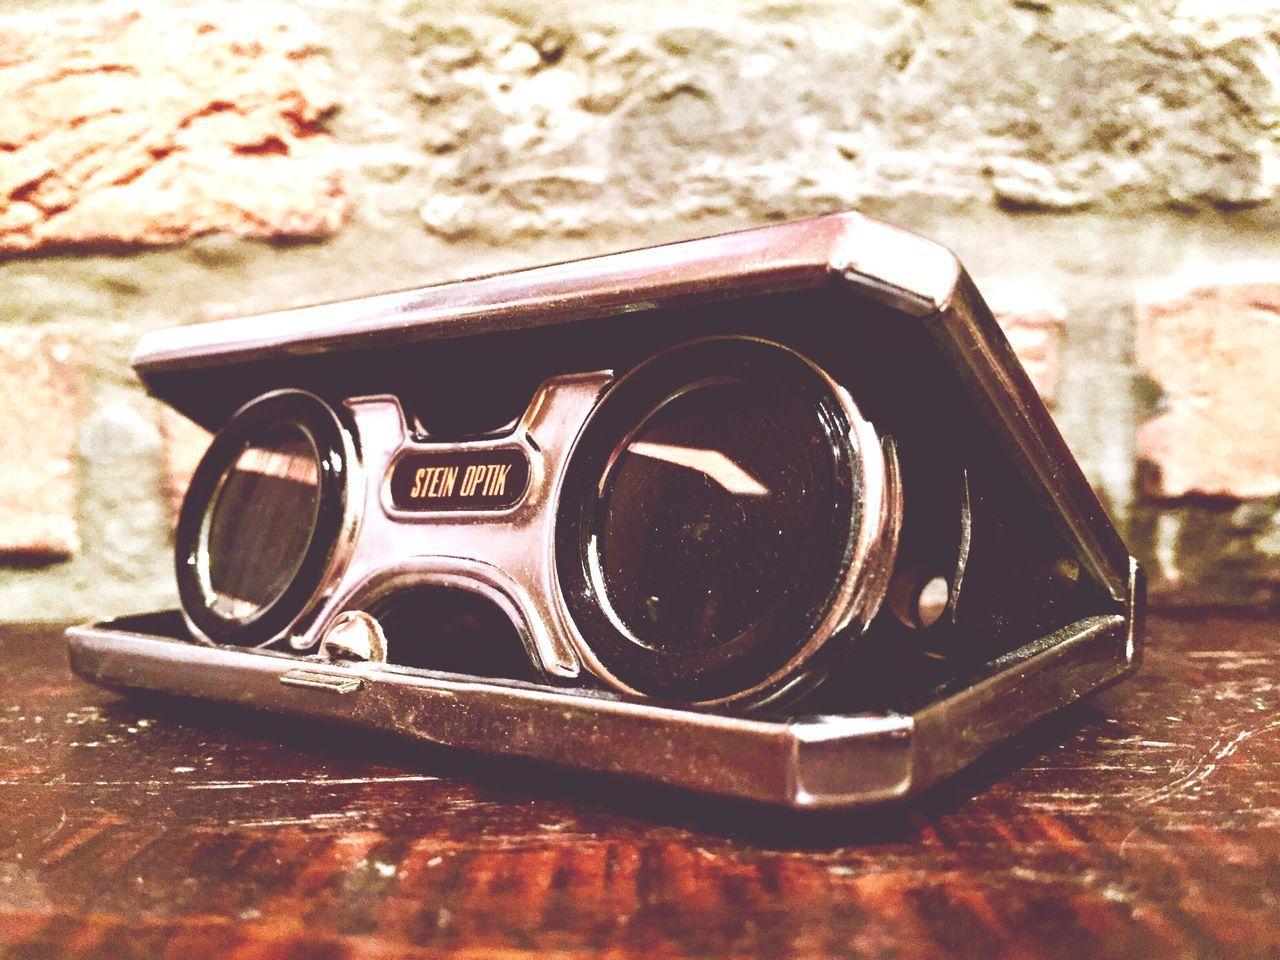 Lieblingsteil Fleemarket Tresures Binoculars